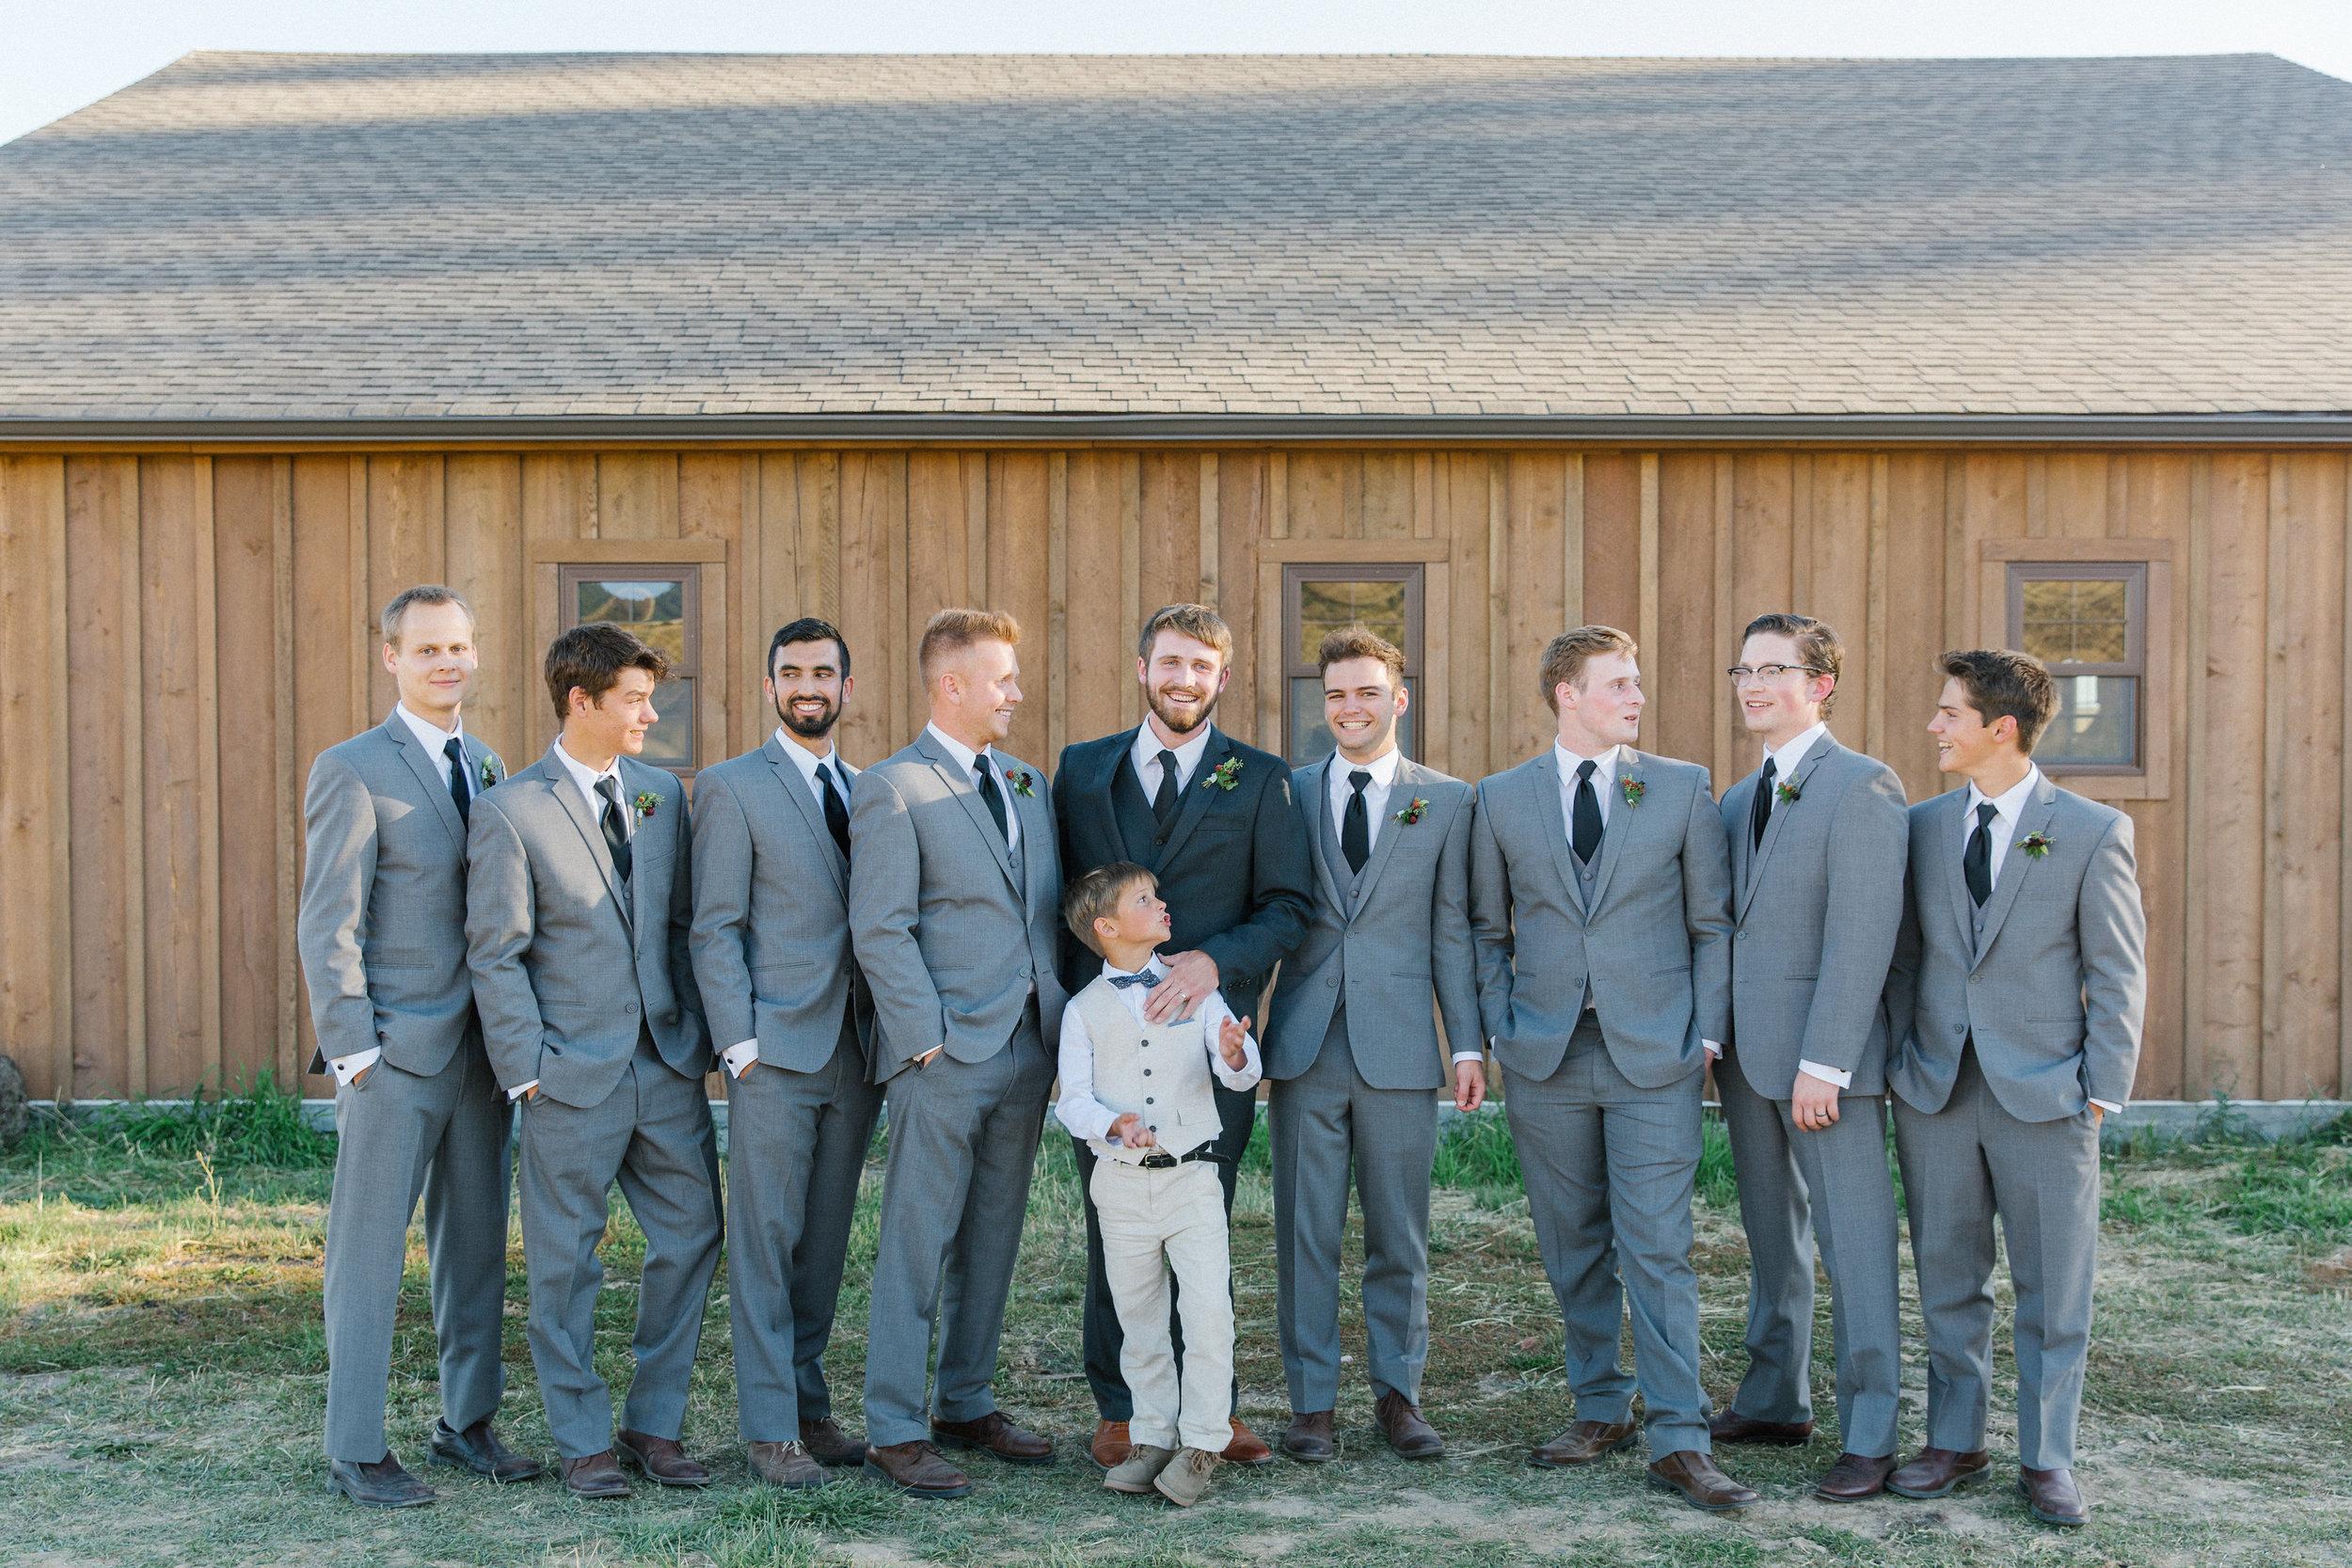 Idaho-Field-Forest-Wedding-Film-Photographer-Kristina-Adams-637.jpg